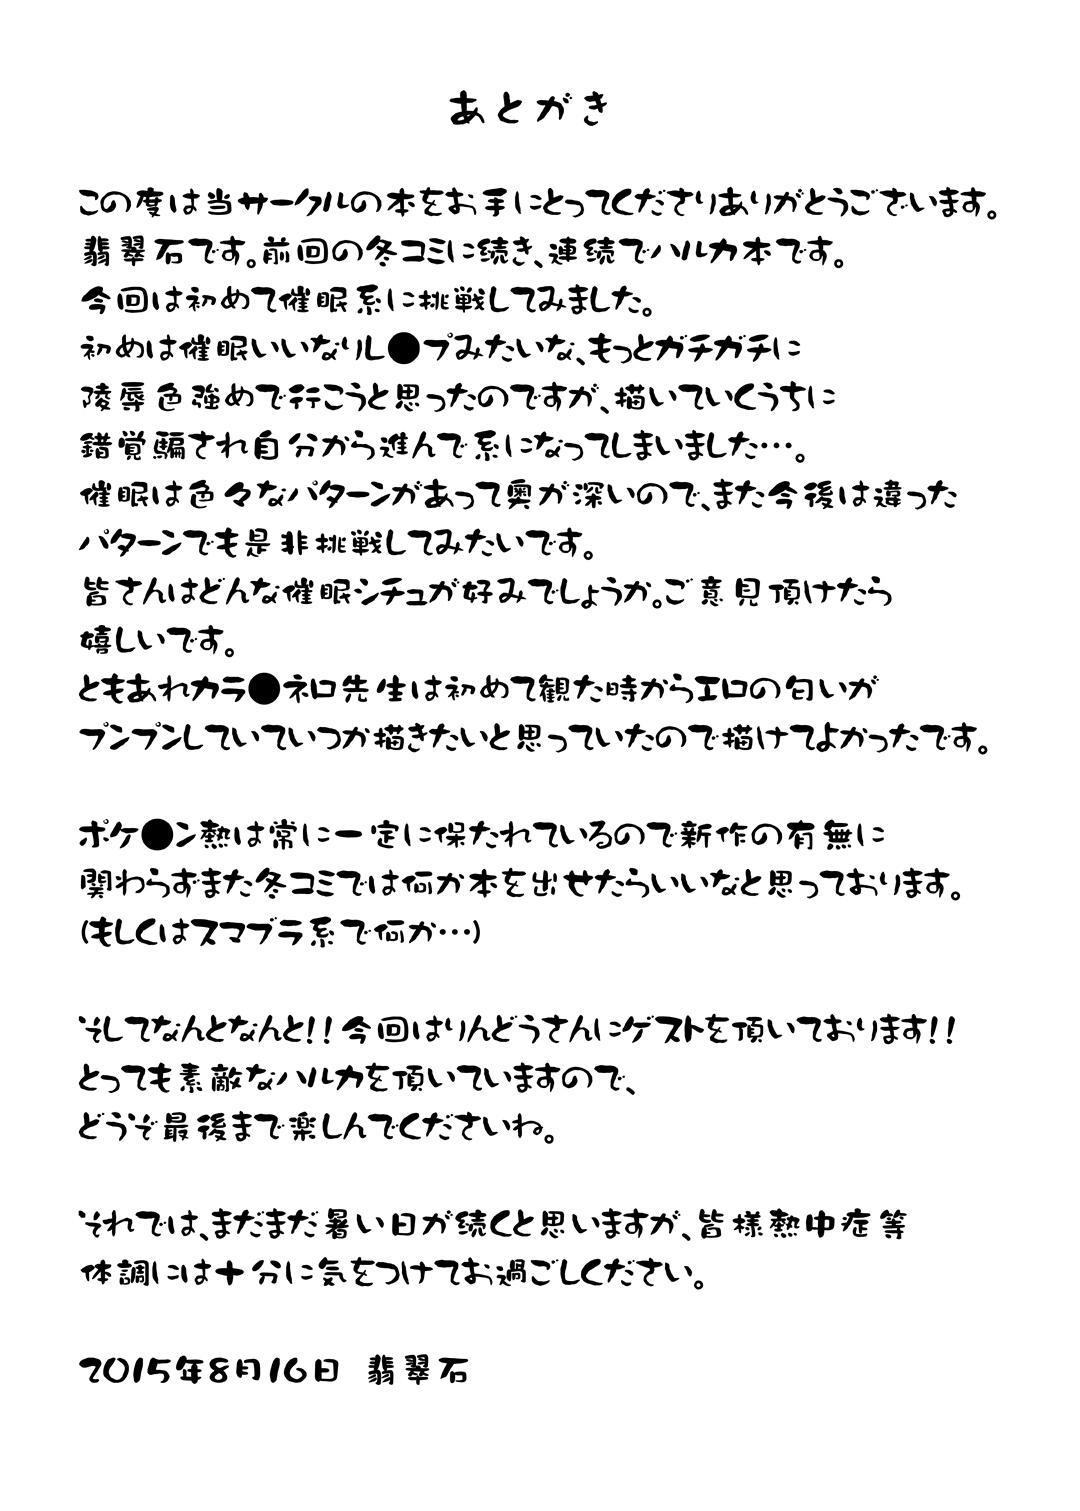 Pokemon Trainer Haruka Kyousei Saimin Battle   Pokemon Trainer May's Forced Hypnosis Battle 19